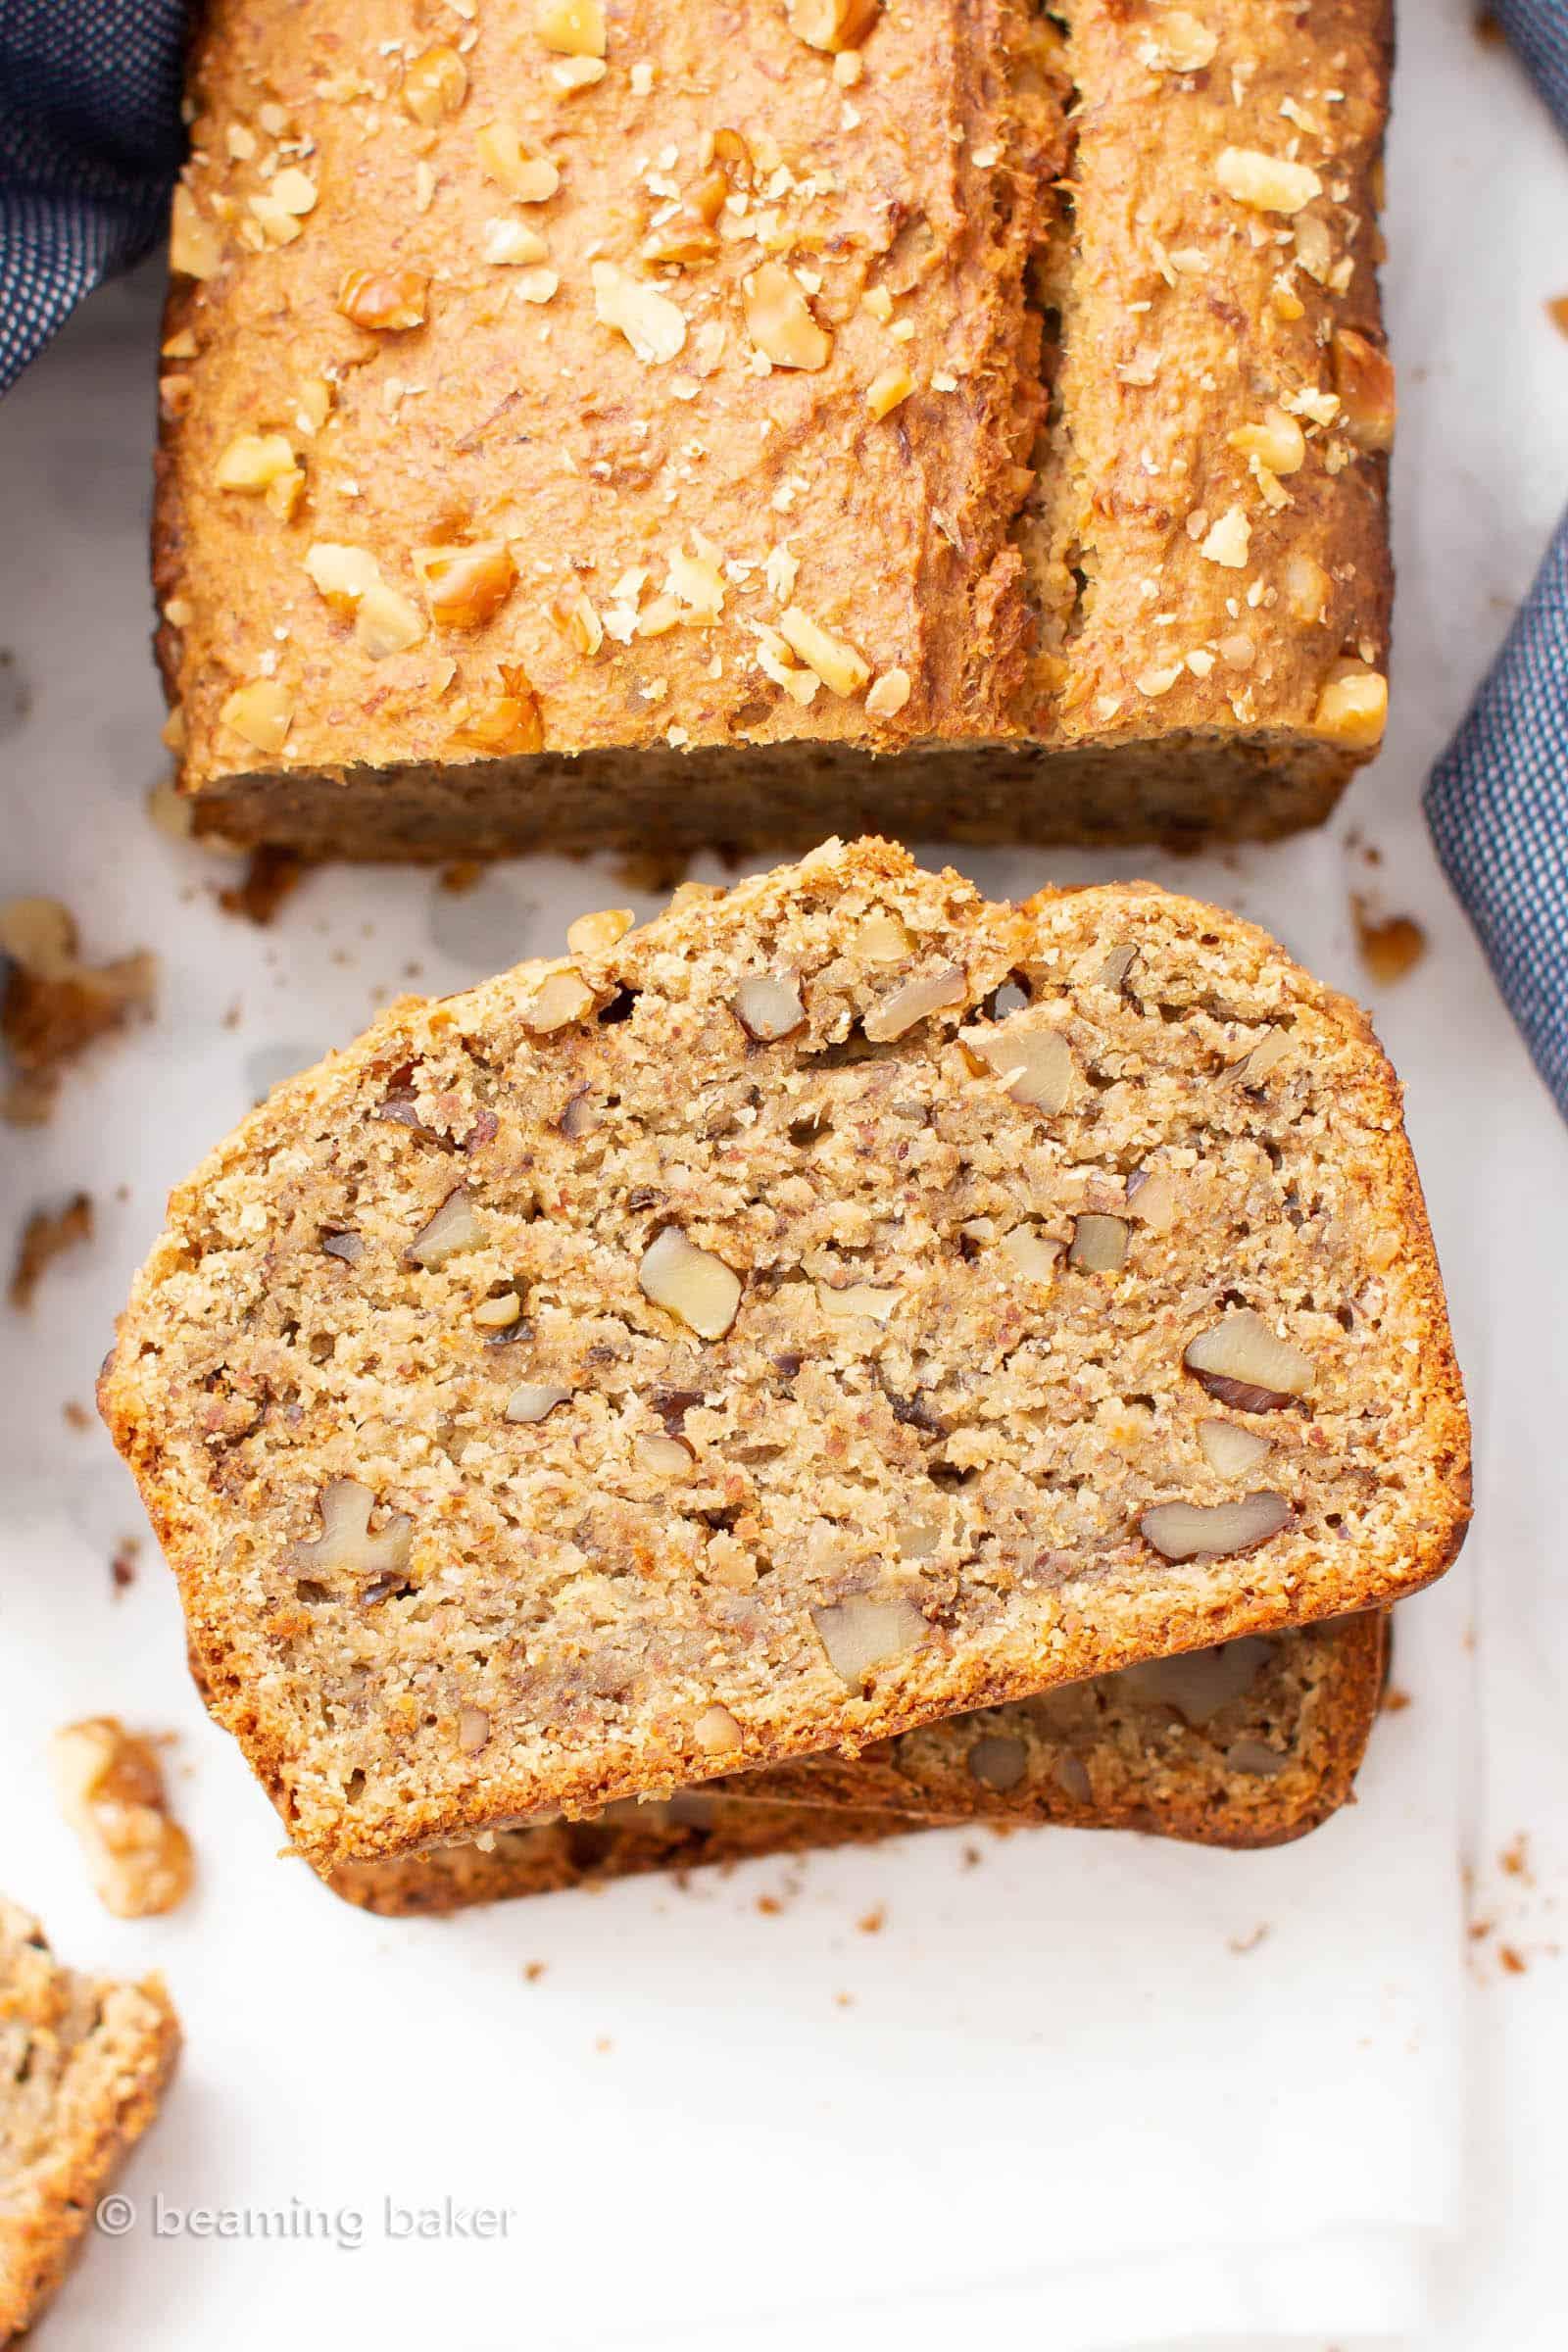 Vegan Gluten Free Banana Bread (GF): an amazing 1-bowl vegan gluten free banana bread recipe that yields perfectly moist banana bread bursting with banana flavor! Vegan, Gluten Free. #VeganGlutenFree #BananaBread #GlutenFreeVegan #Banana #VGF | Recipe at BeamingBaker.com